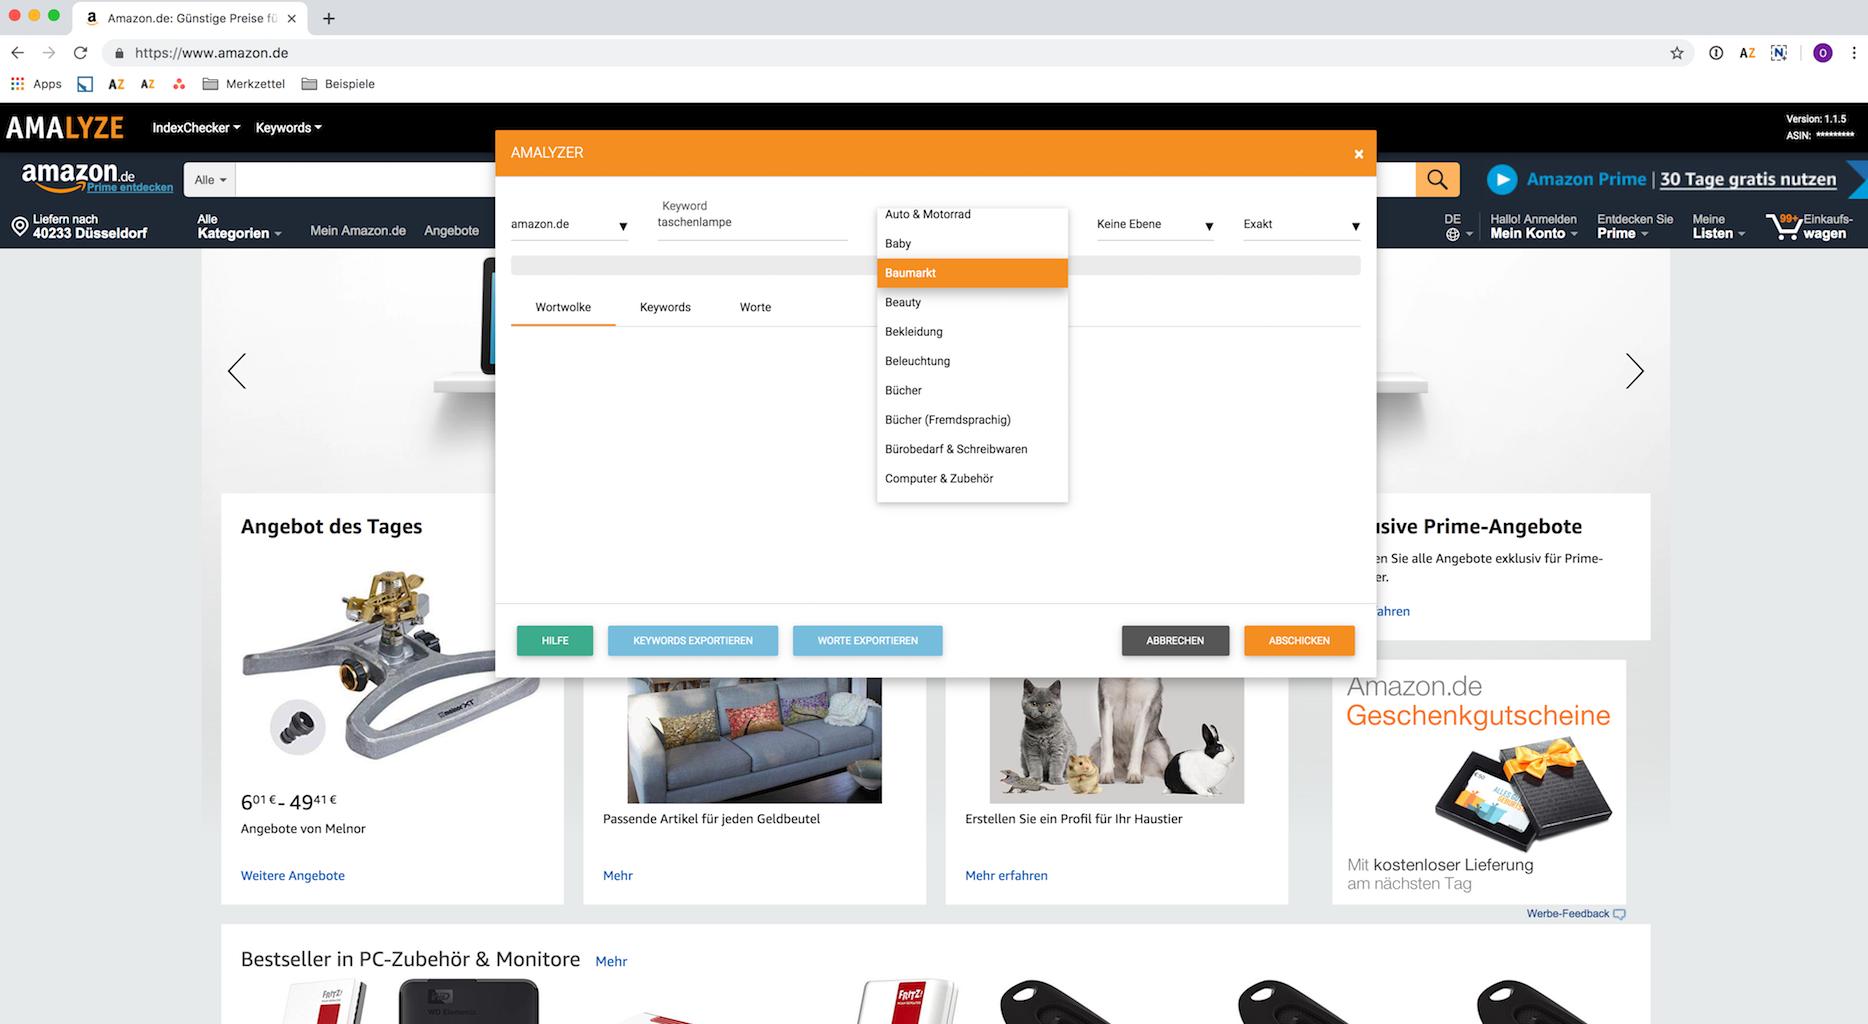 Kostenloses Amazon Tool_AMALYZE Keyword AMALYZER, Grundeinstellungen